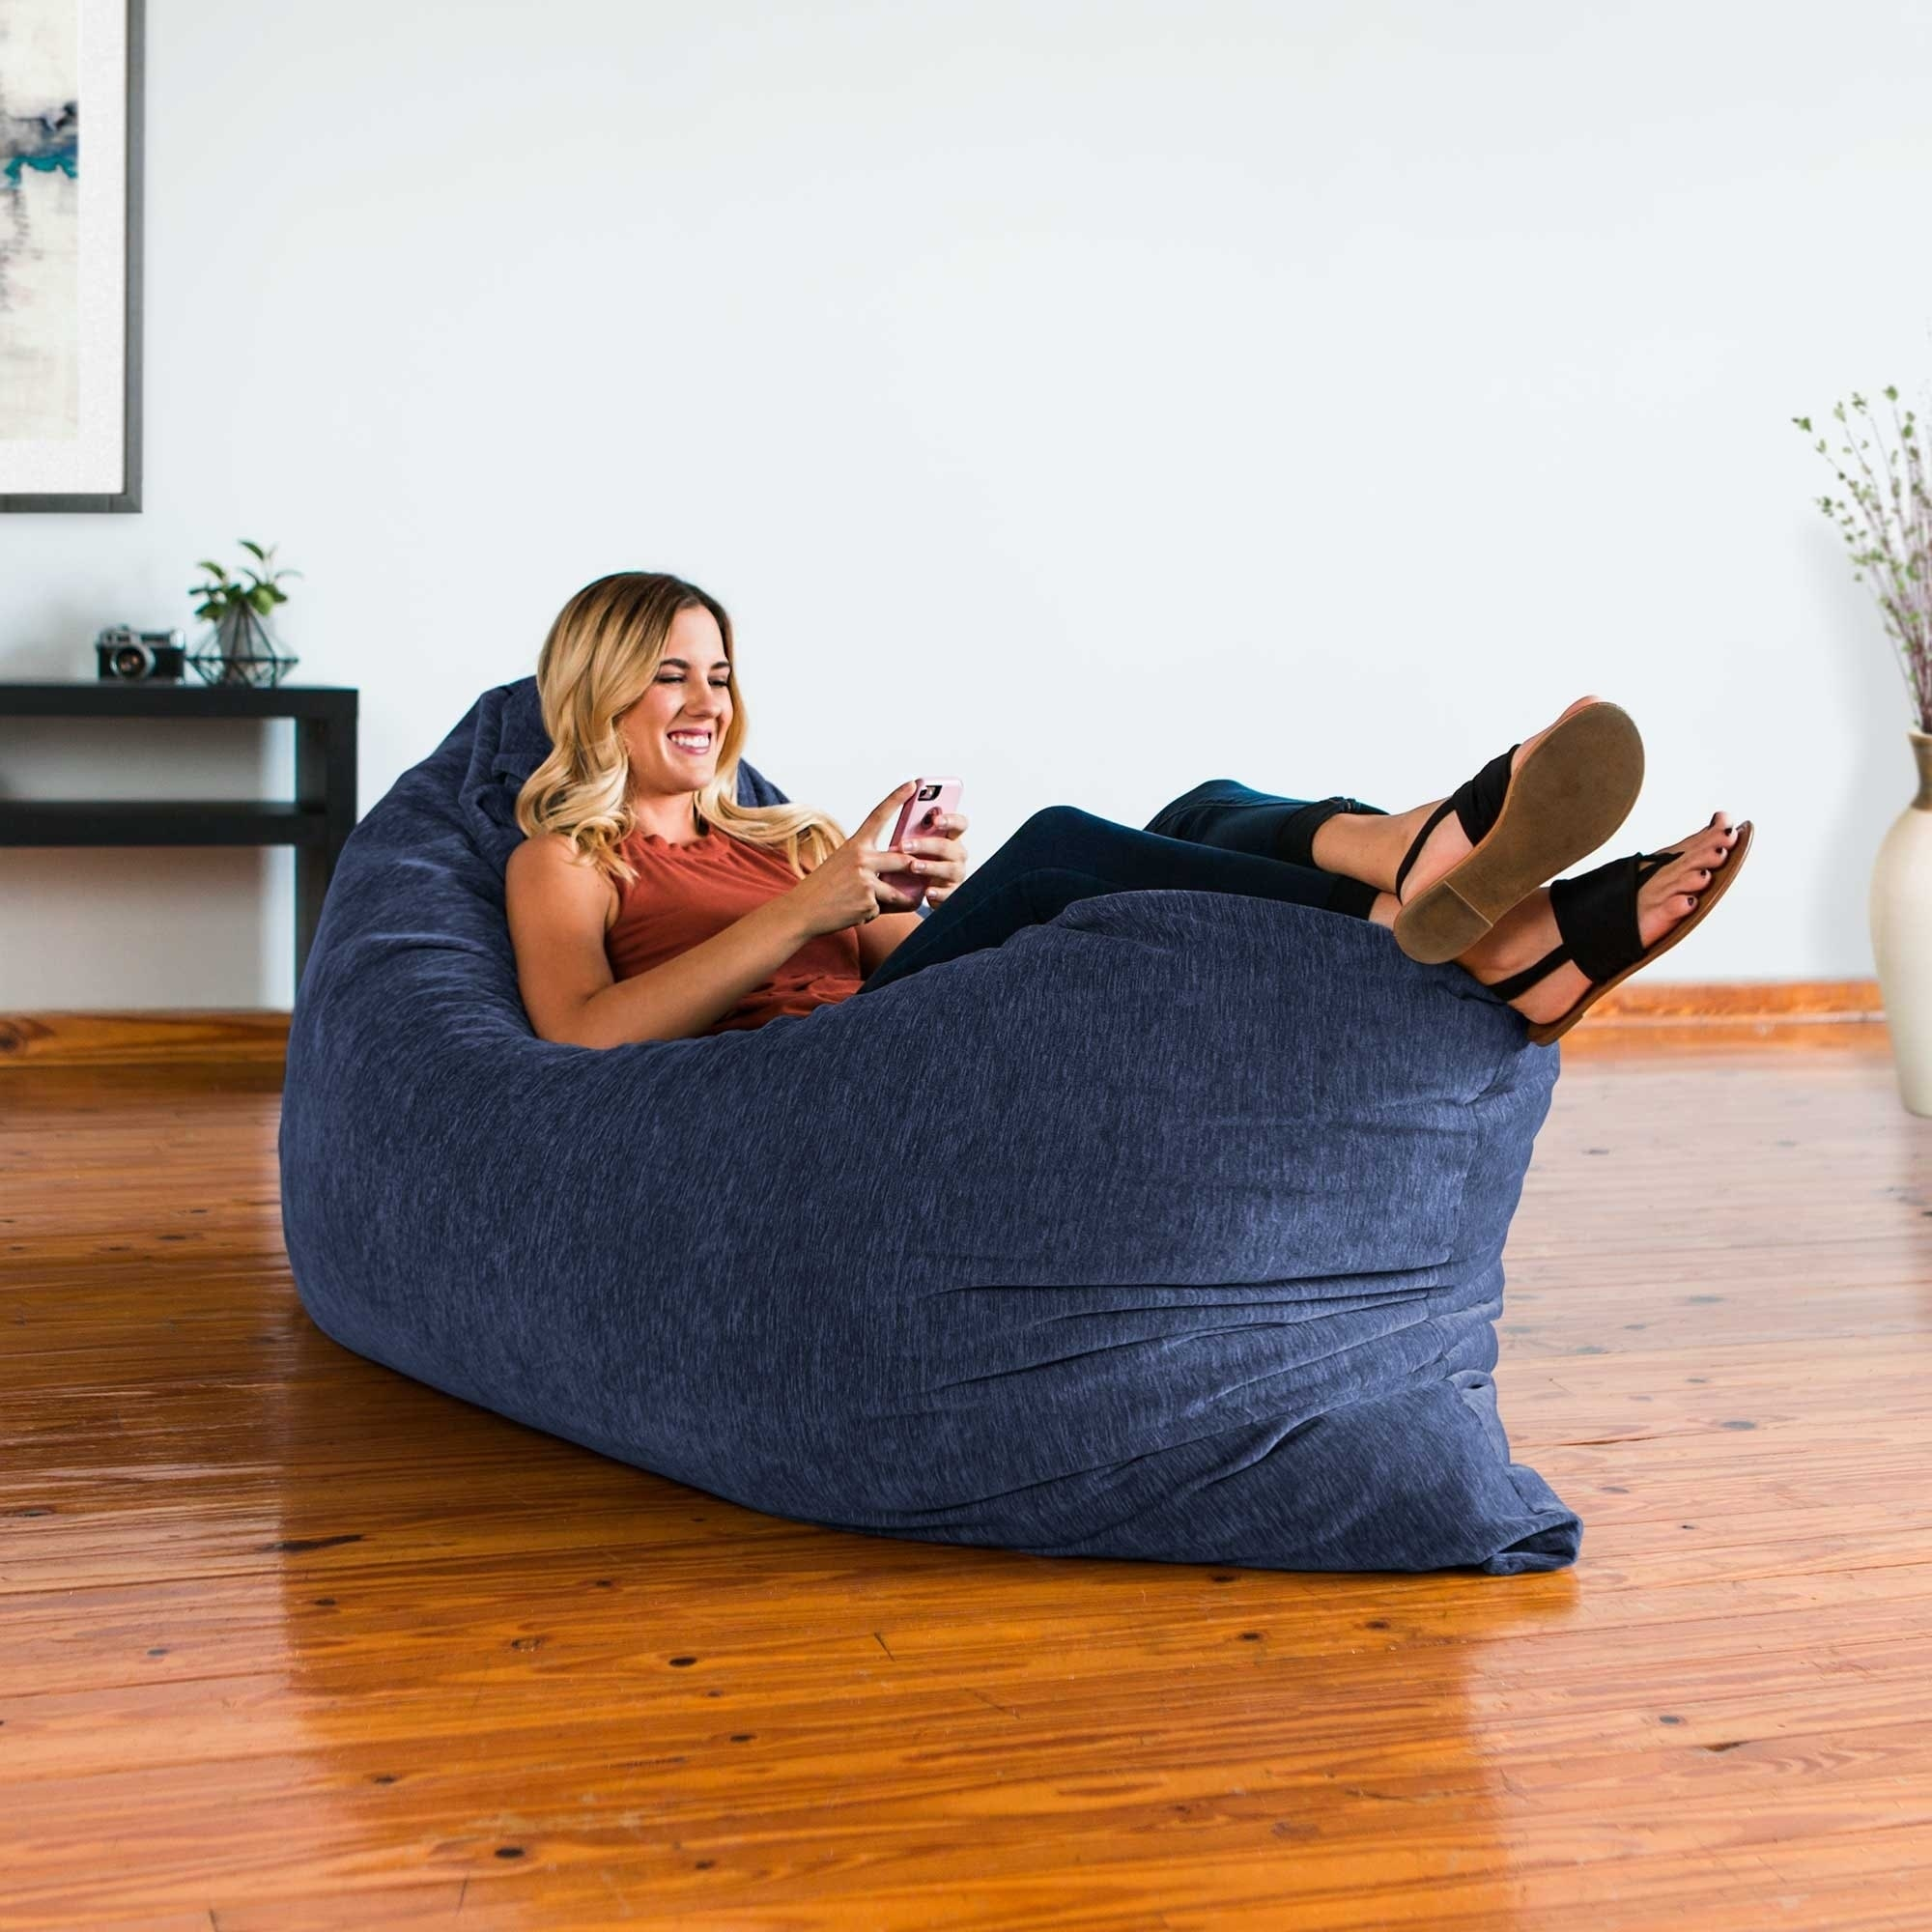 Sensational Jaxx Floor Pillow Bean Bag Lounger With Chenille Cover Spiritservingveterans Wood Chair Design Ideas Spiritservingveteransorg